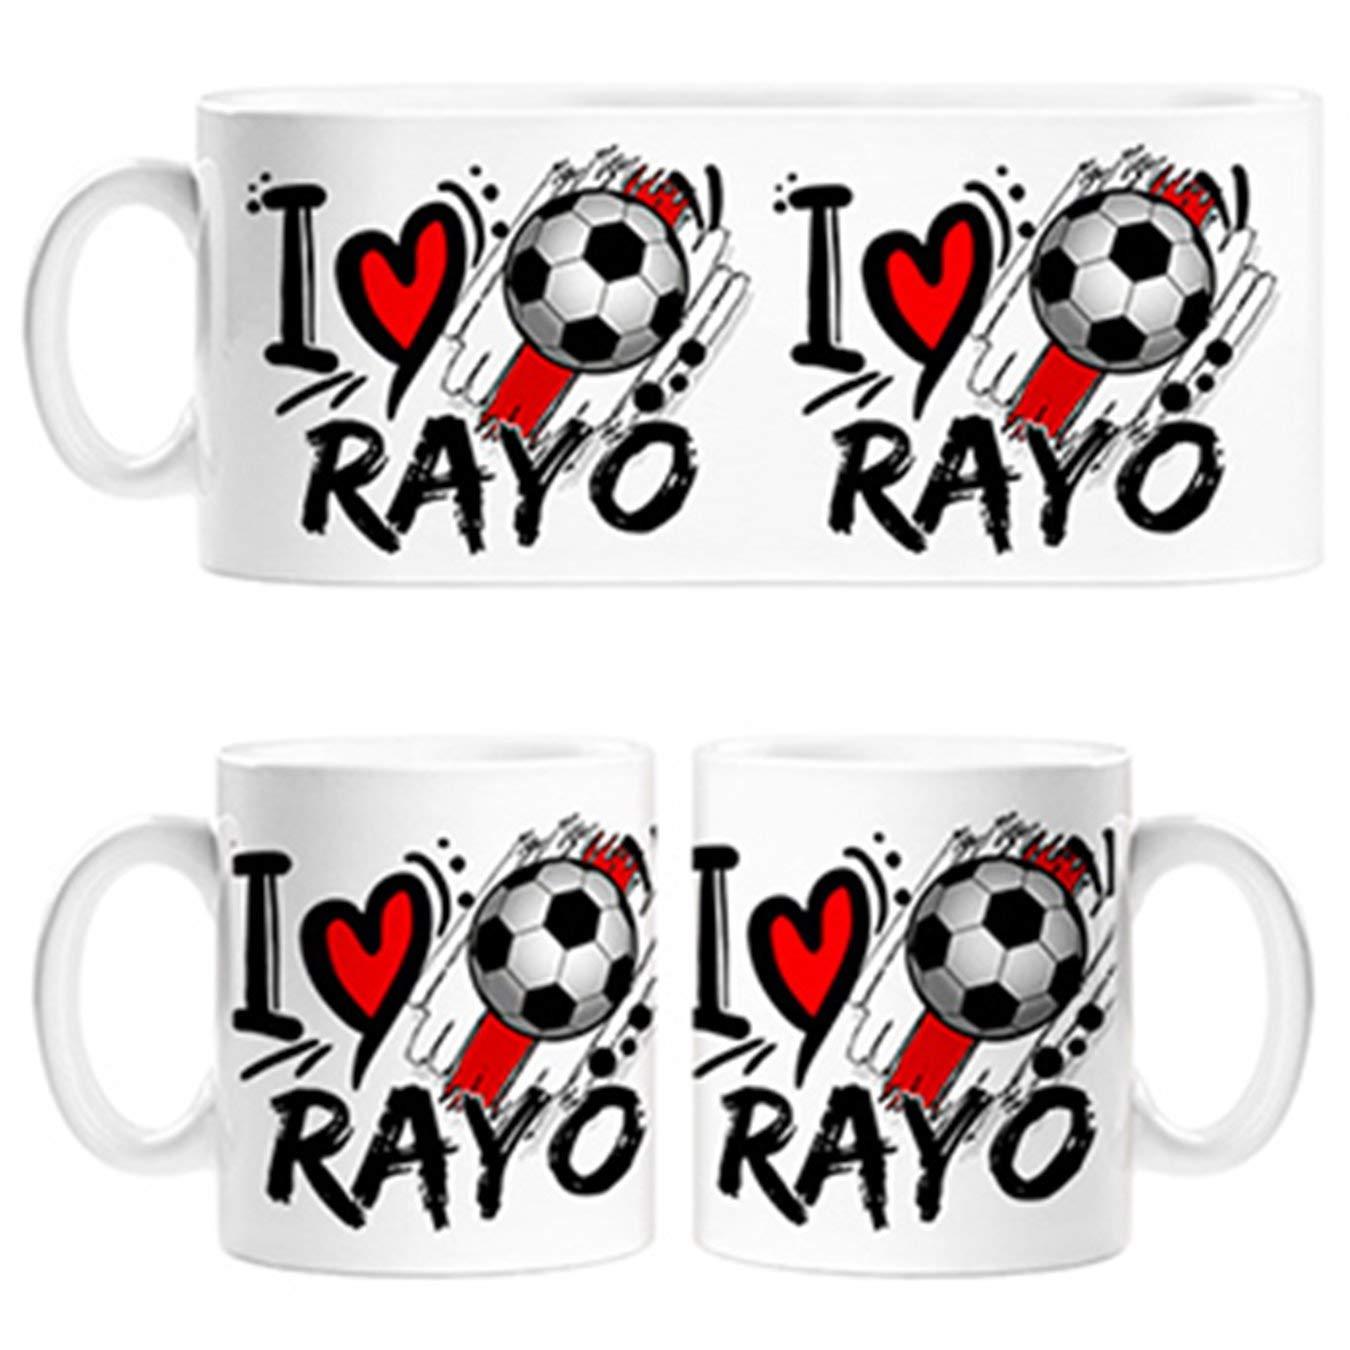 Diver Tazas Taza I Love Rayo fútbol - Cerámica: Amazon.es: Hogar